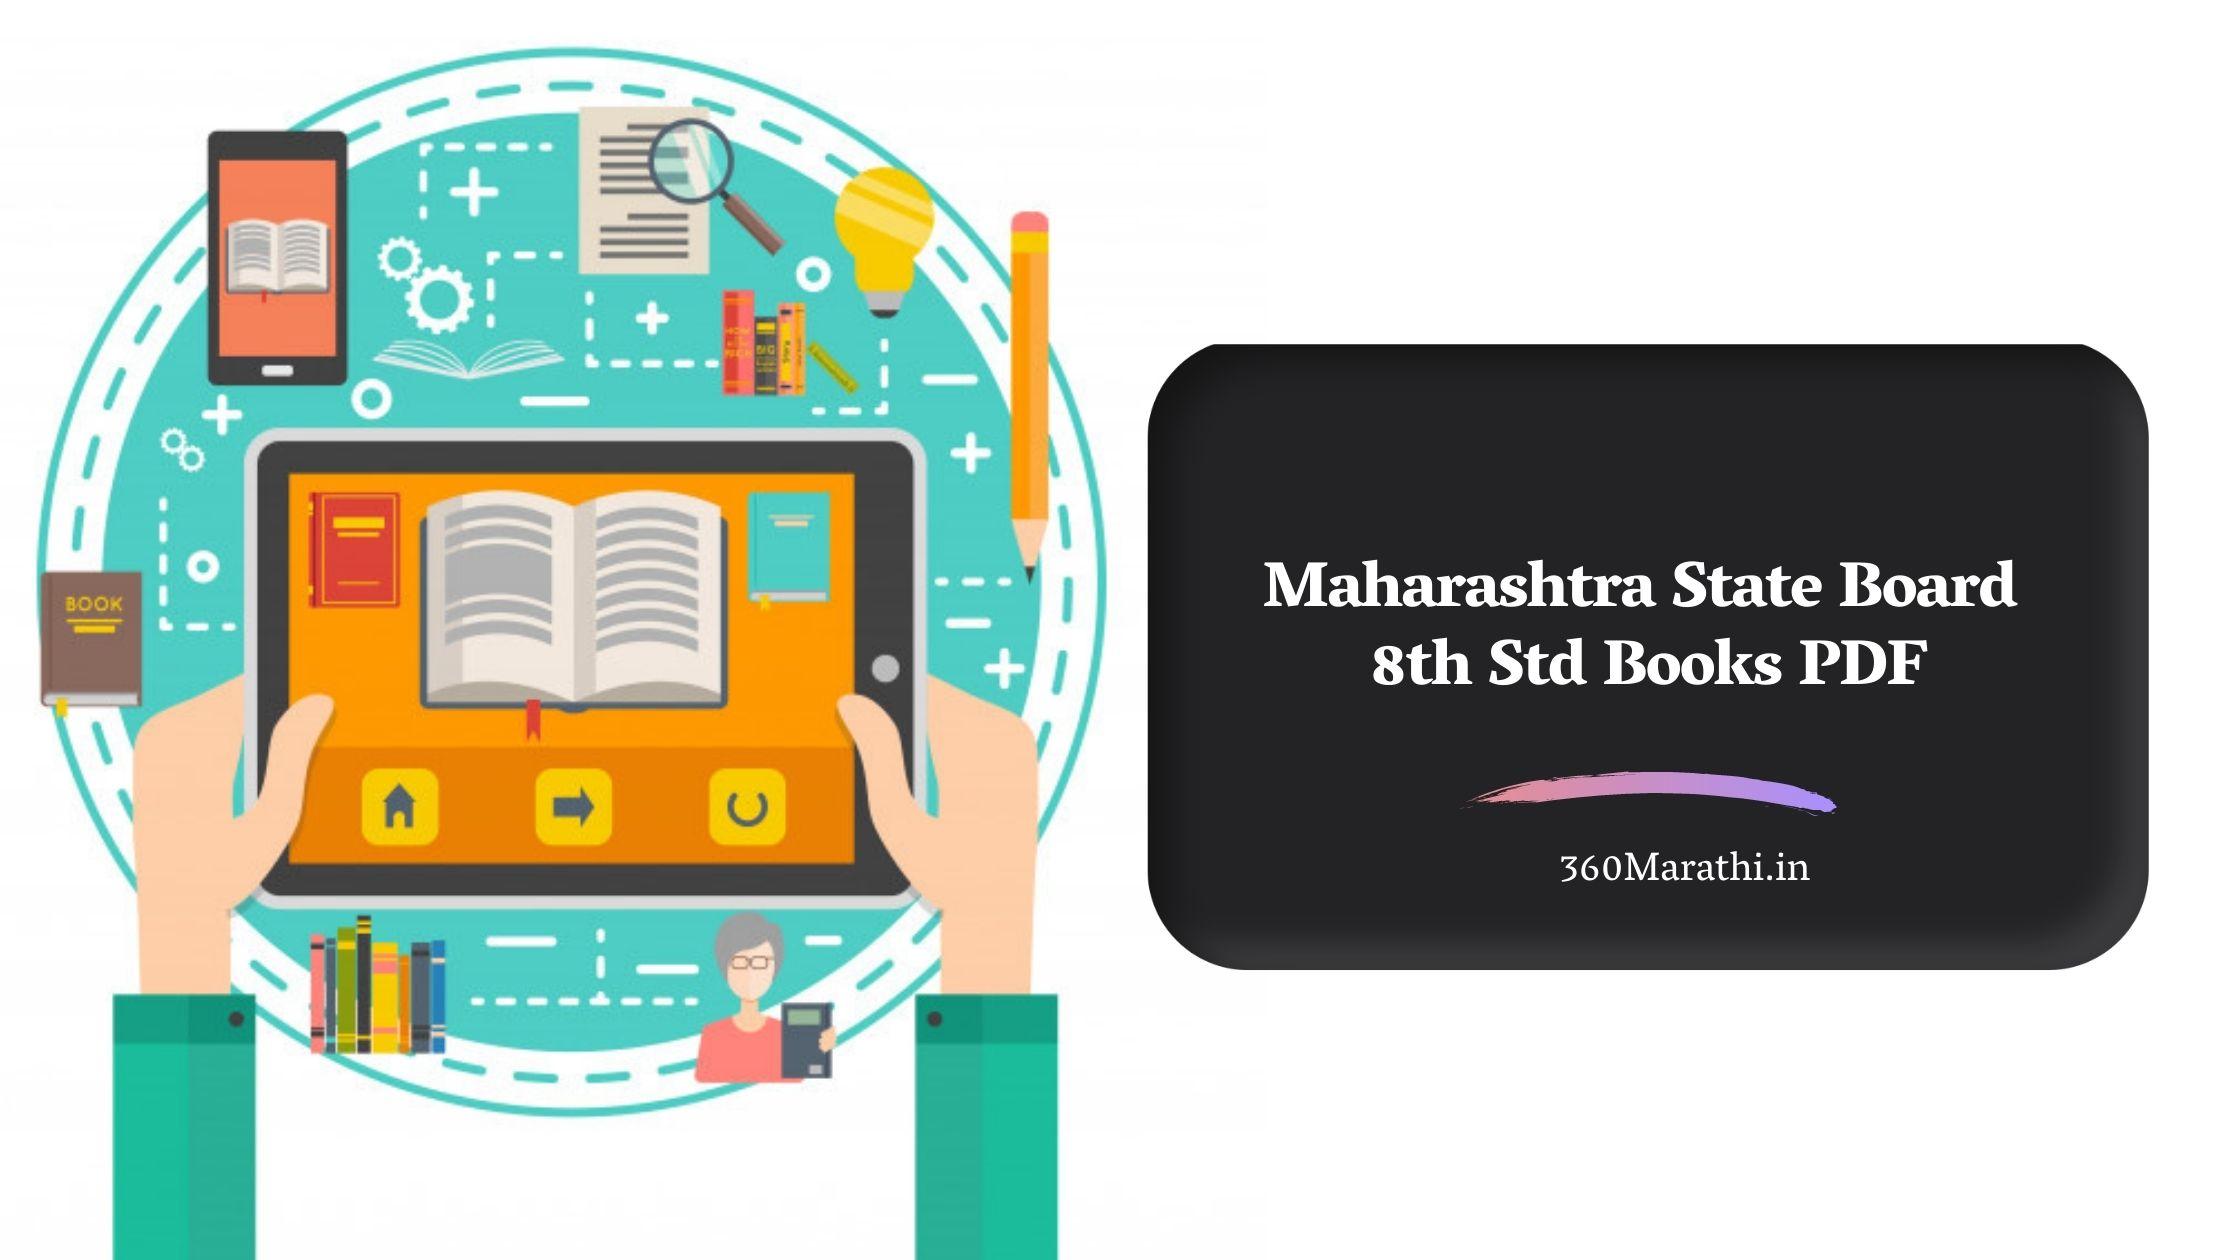 Maharashtra State Board 8th Std Books PDF Free Download